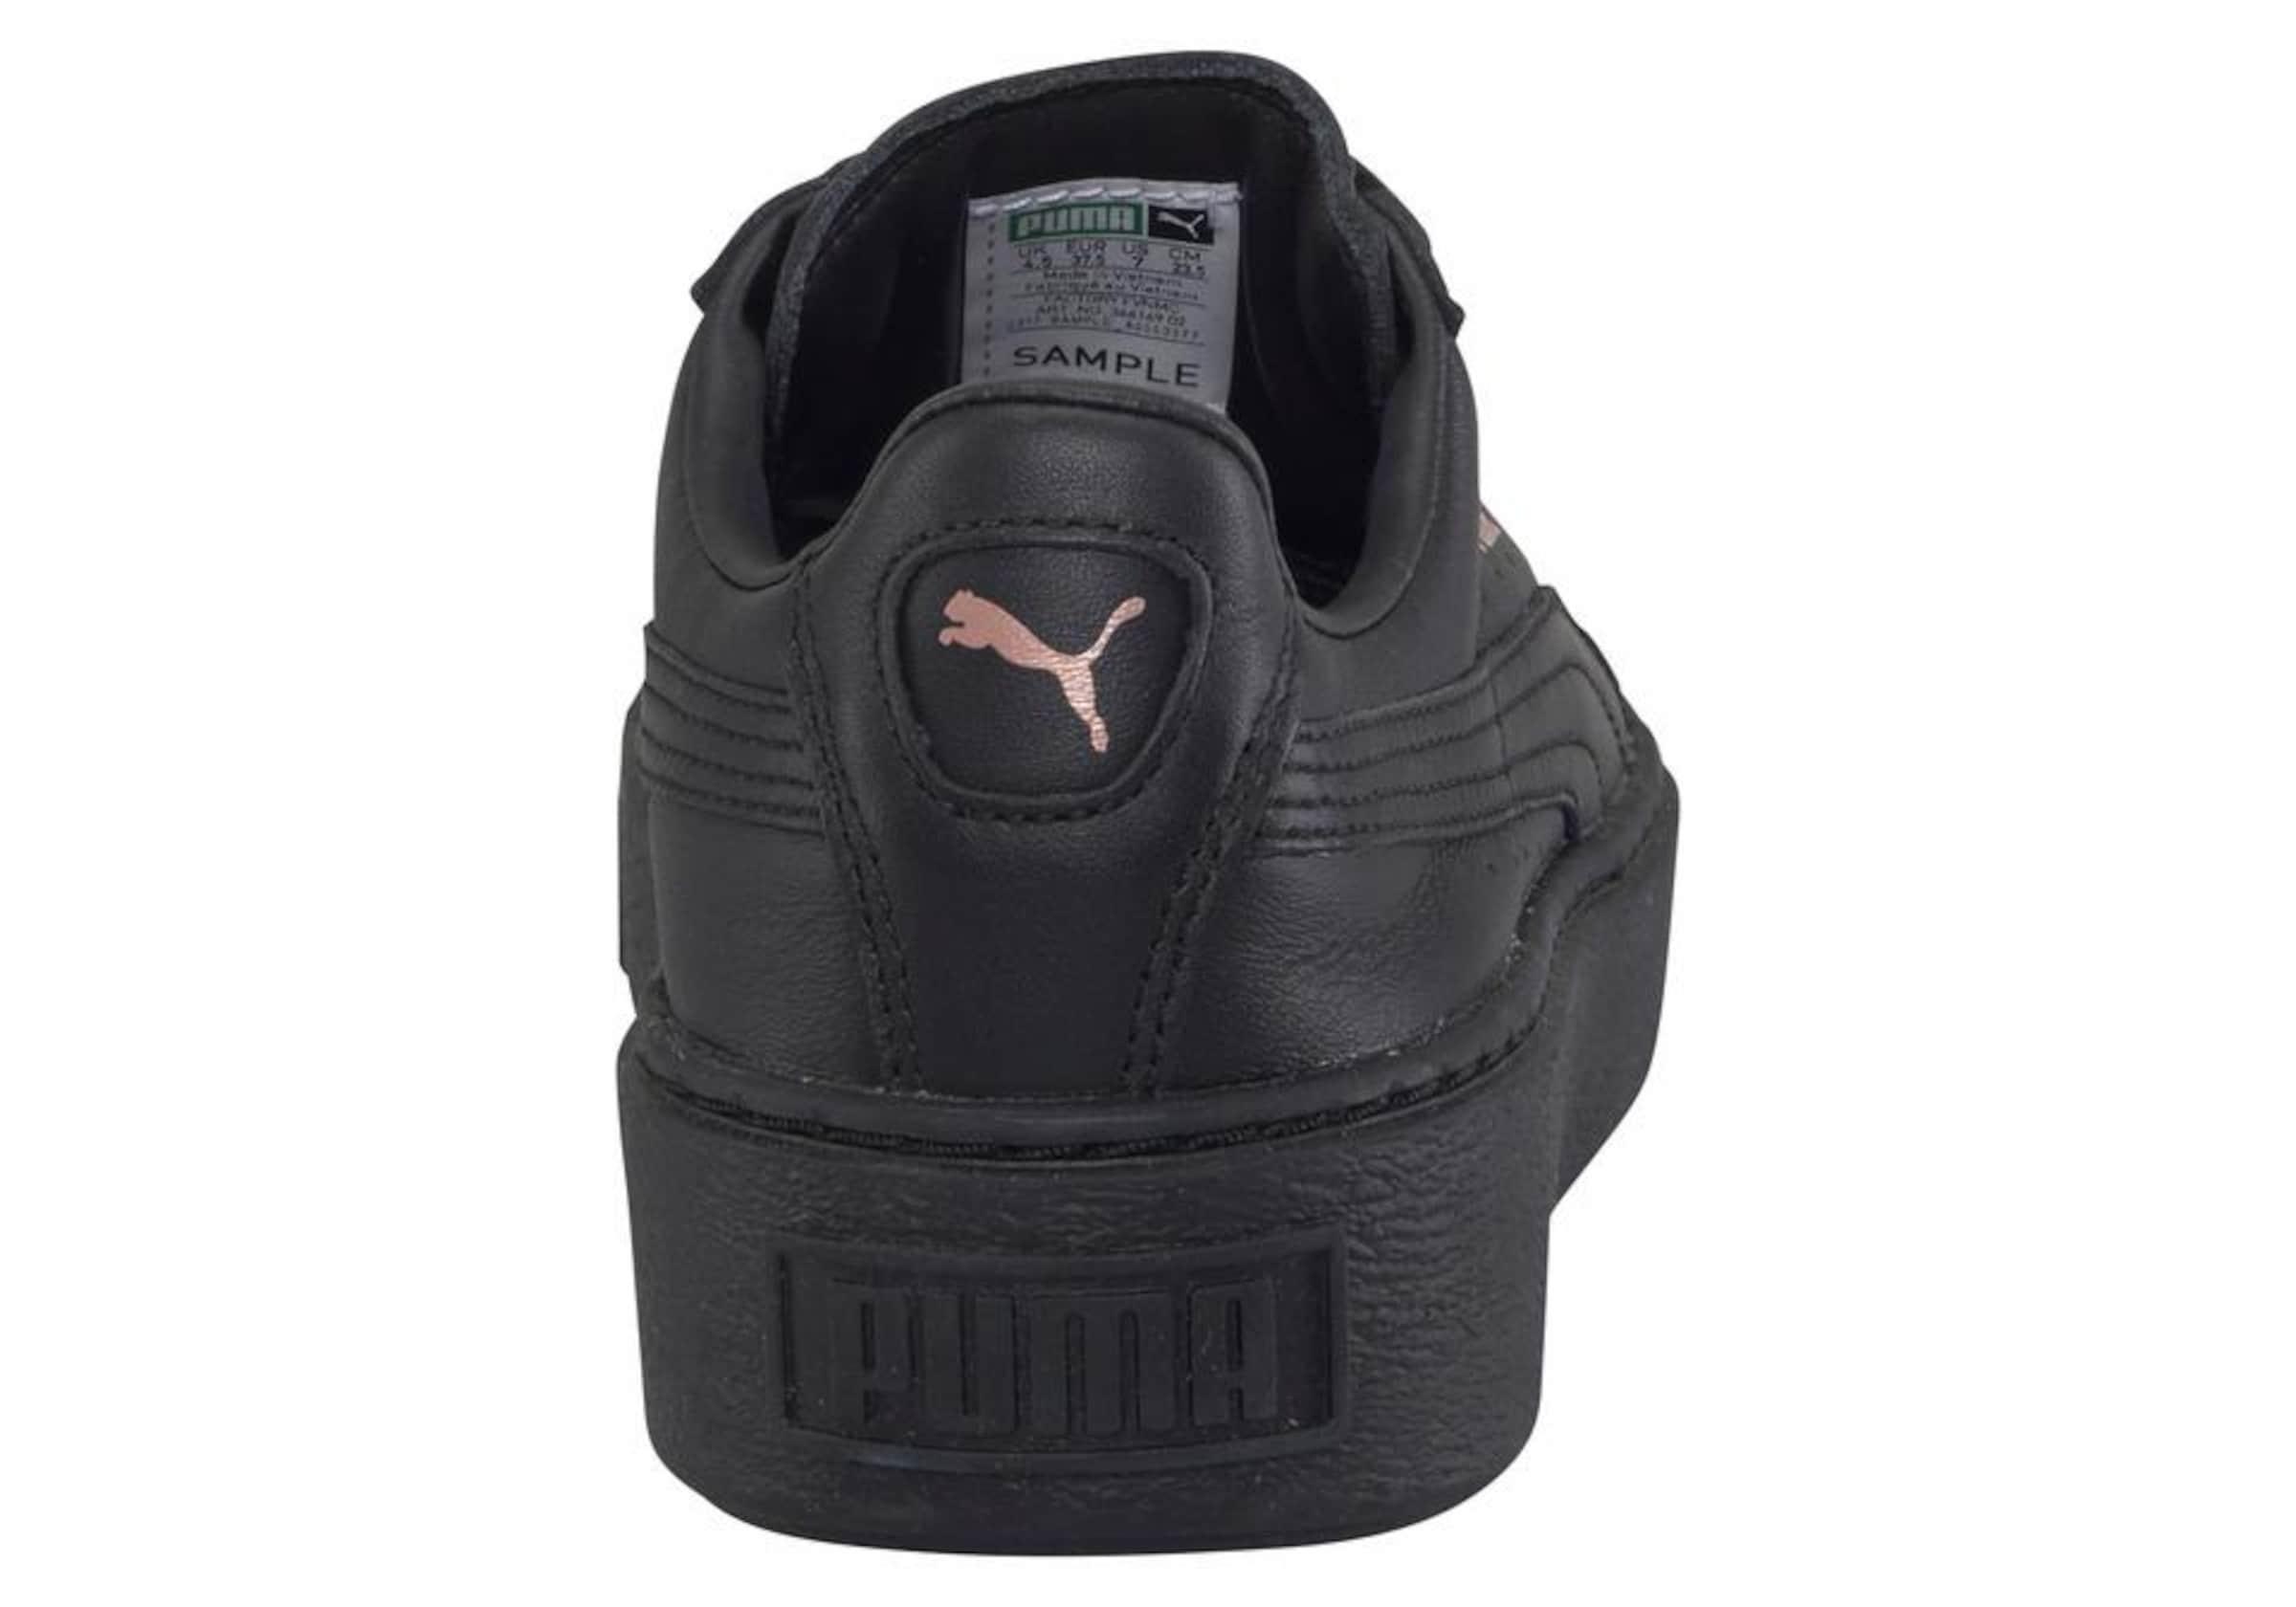 RosegoldSchwarz Puma In Metallic' Sneaker 'basket Platform clFK1J